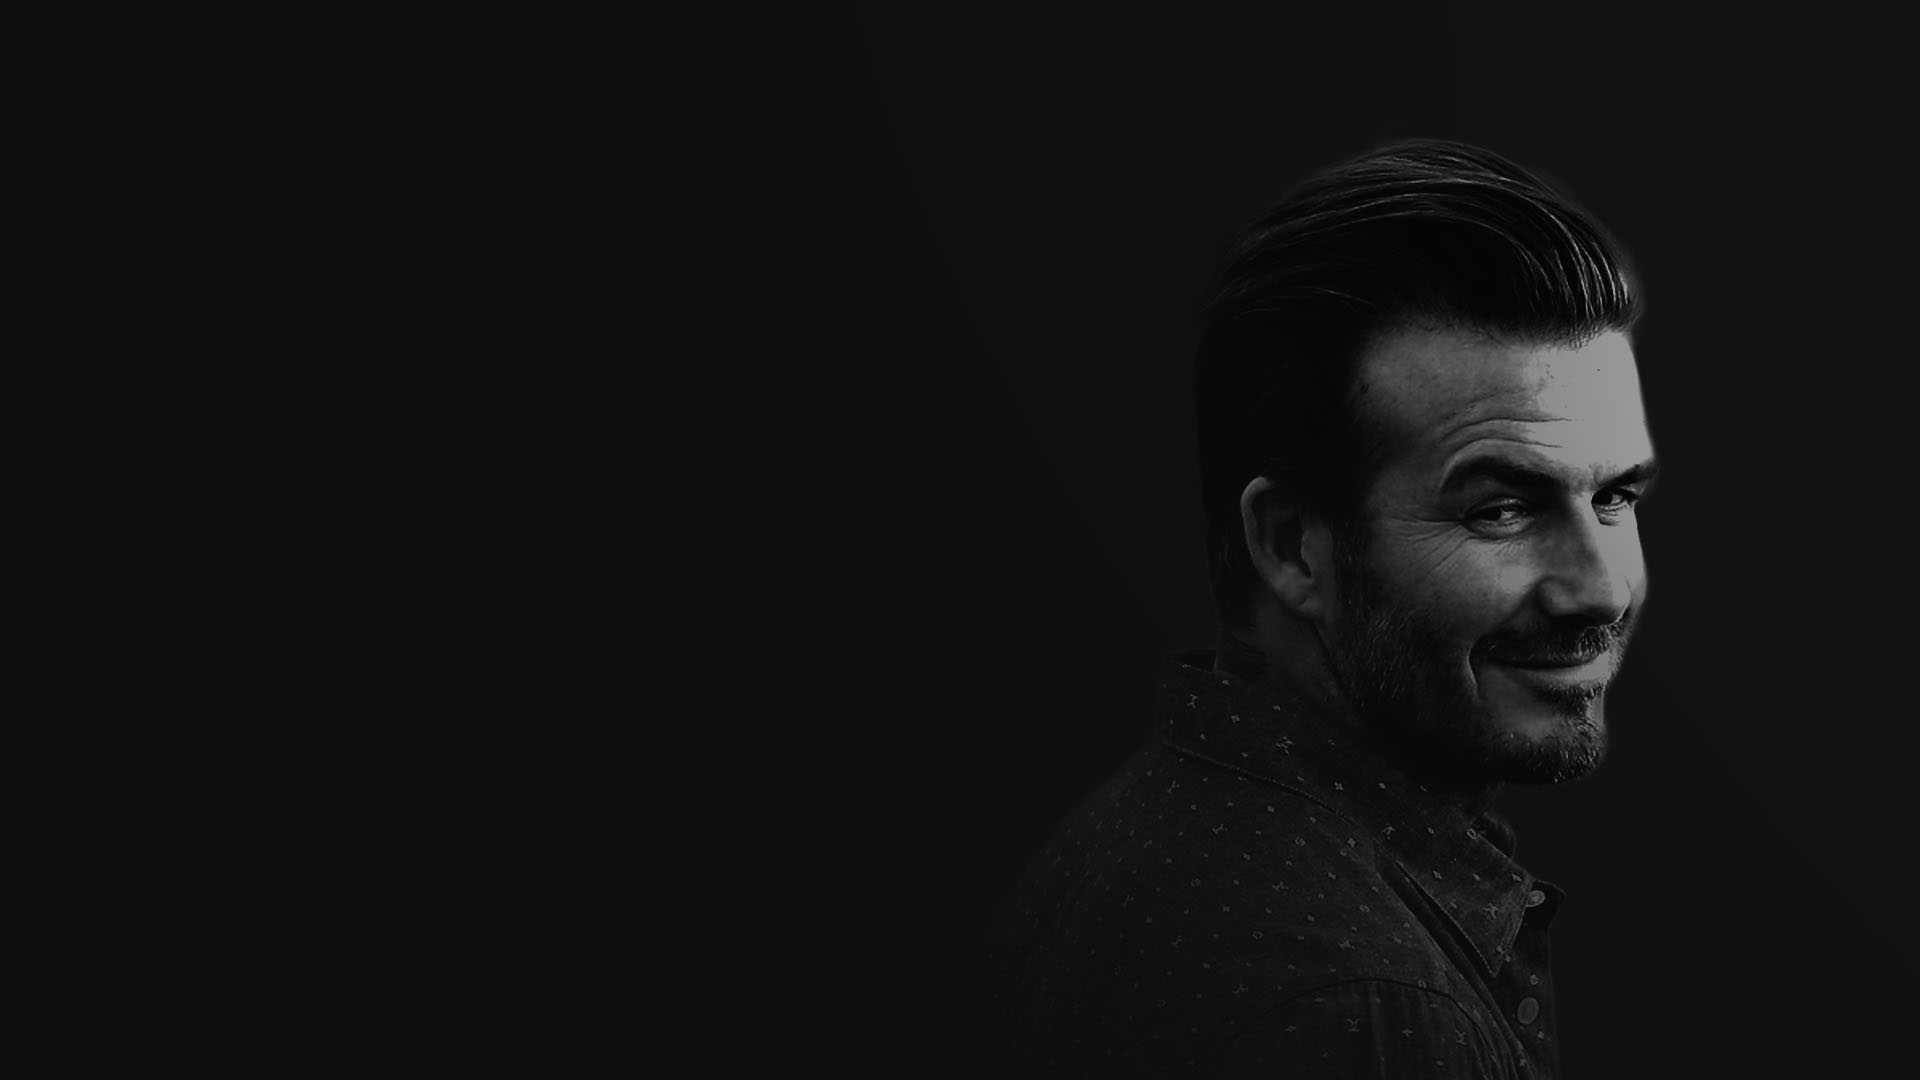 Res: 1920x1080, David Beckham Handsome and Happy